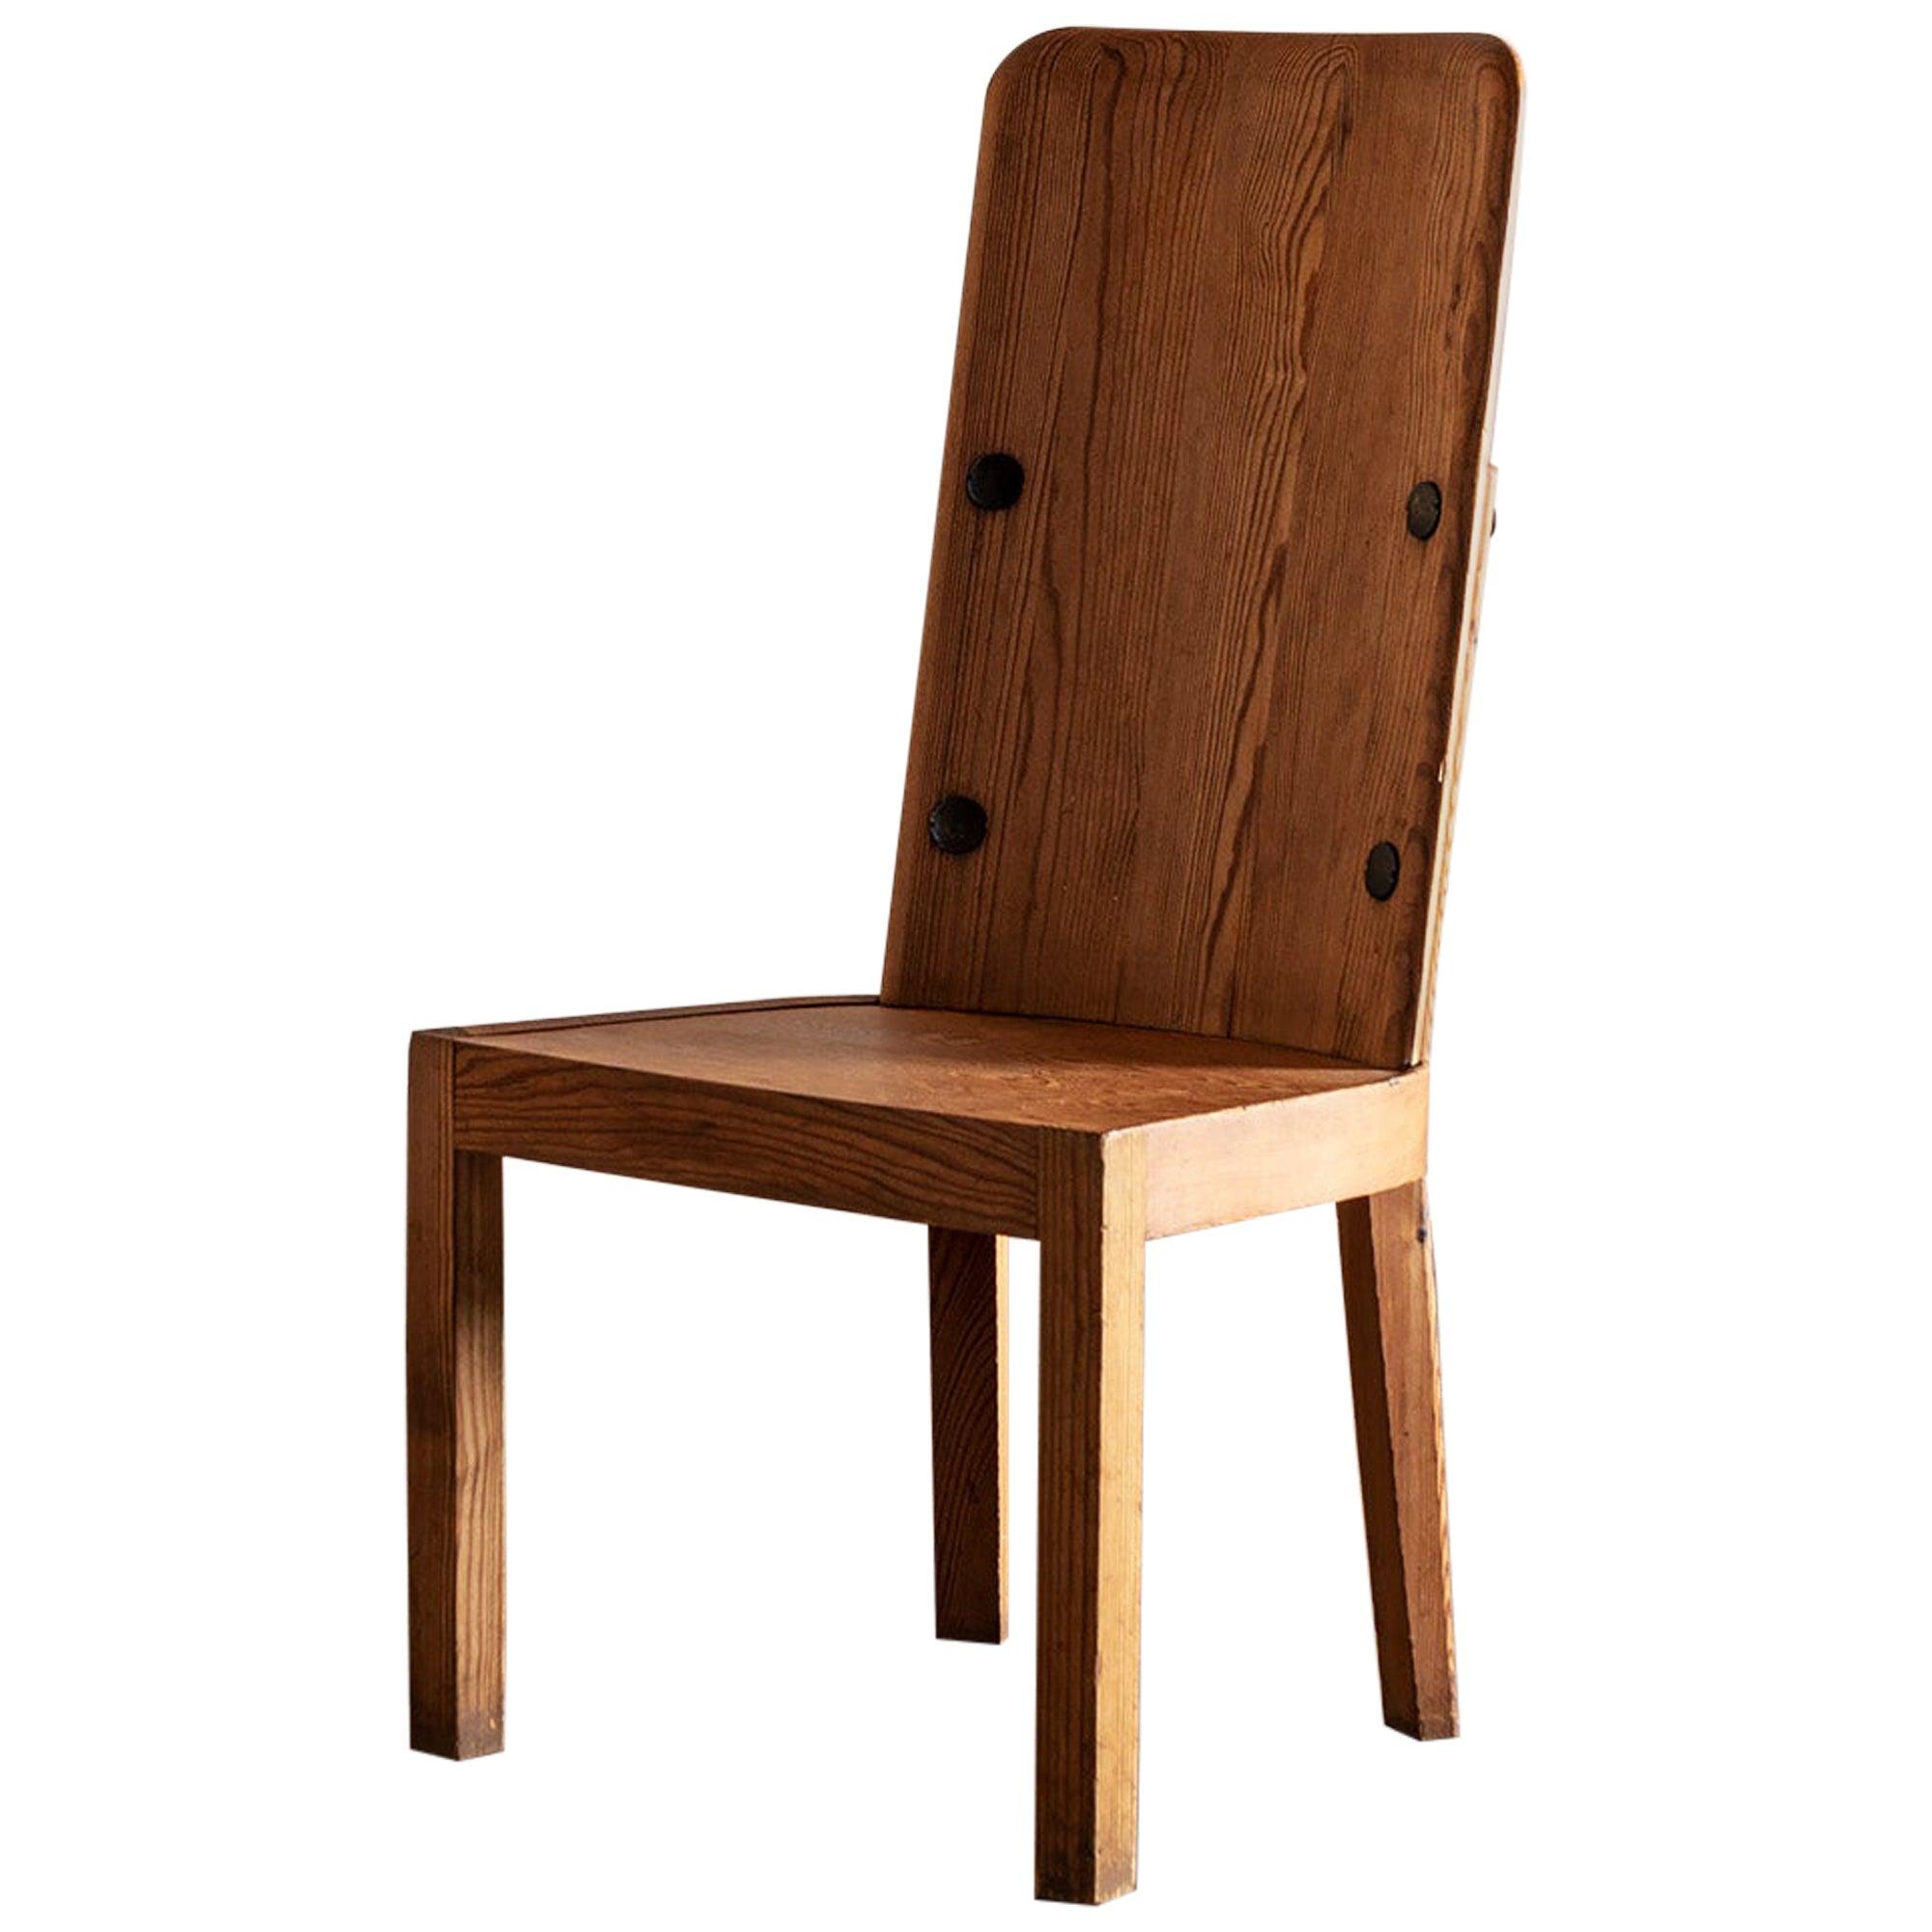 Axel Einar Hjorth Lovo Chair by Nordiska Kompaniet, 1930s